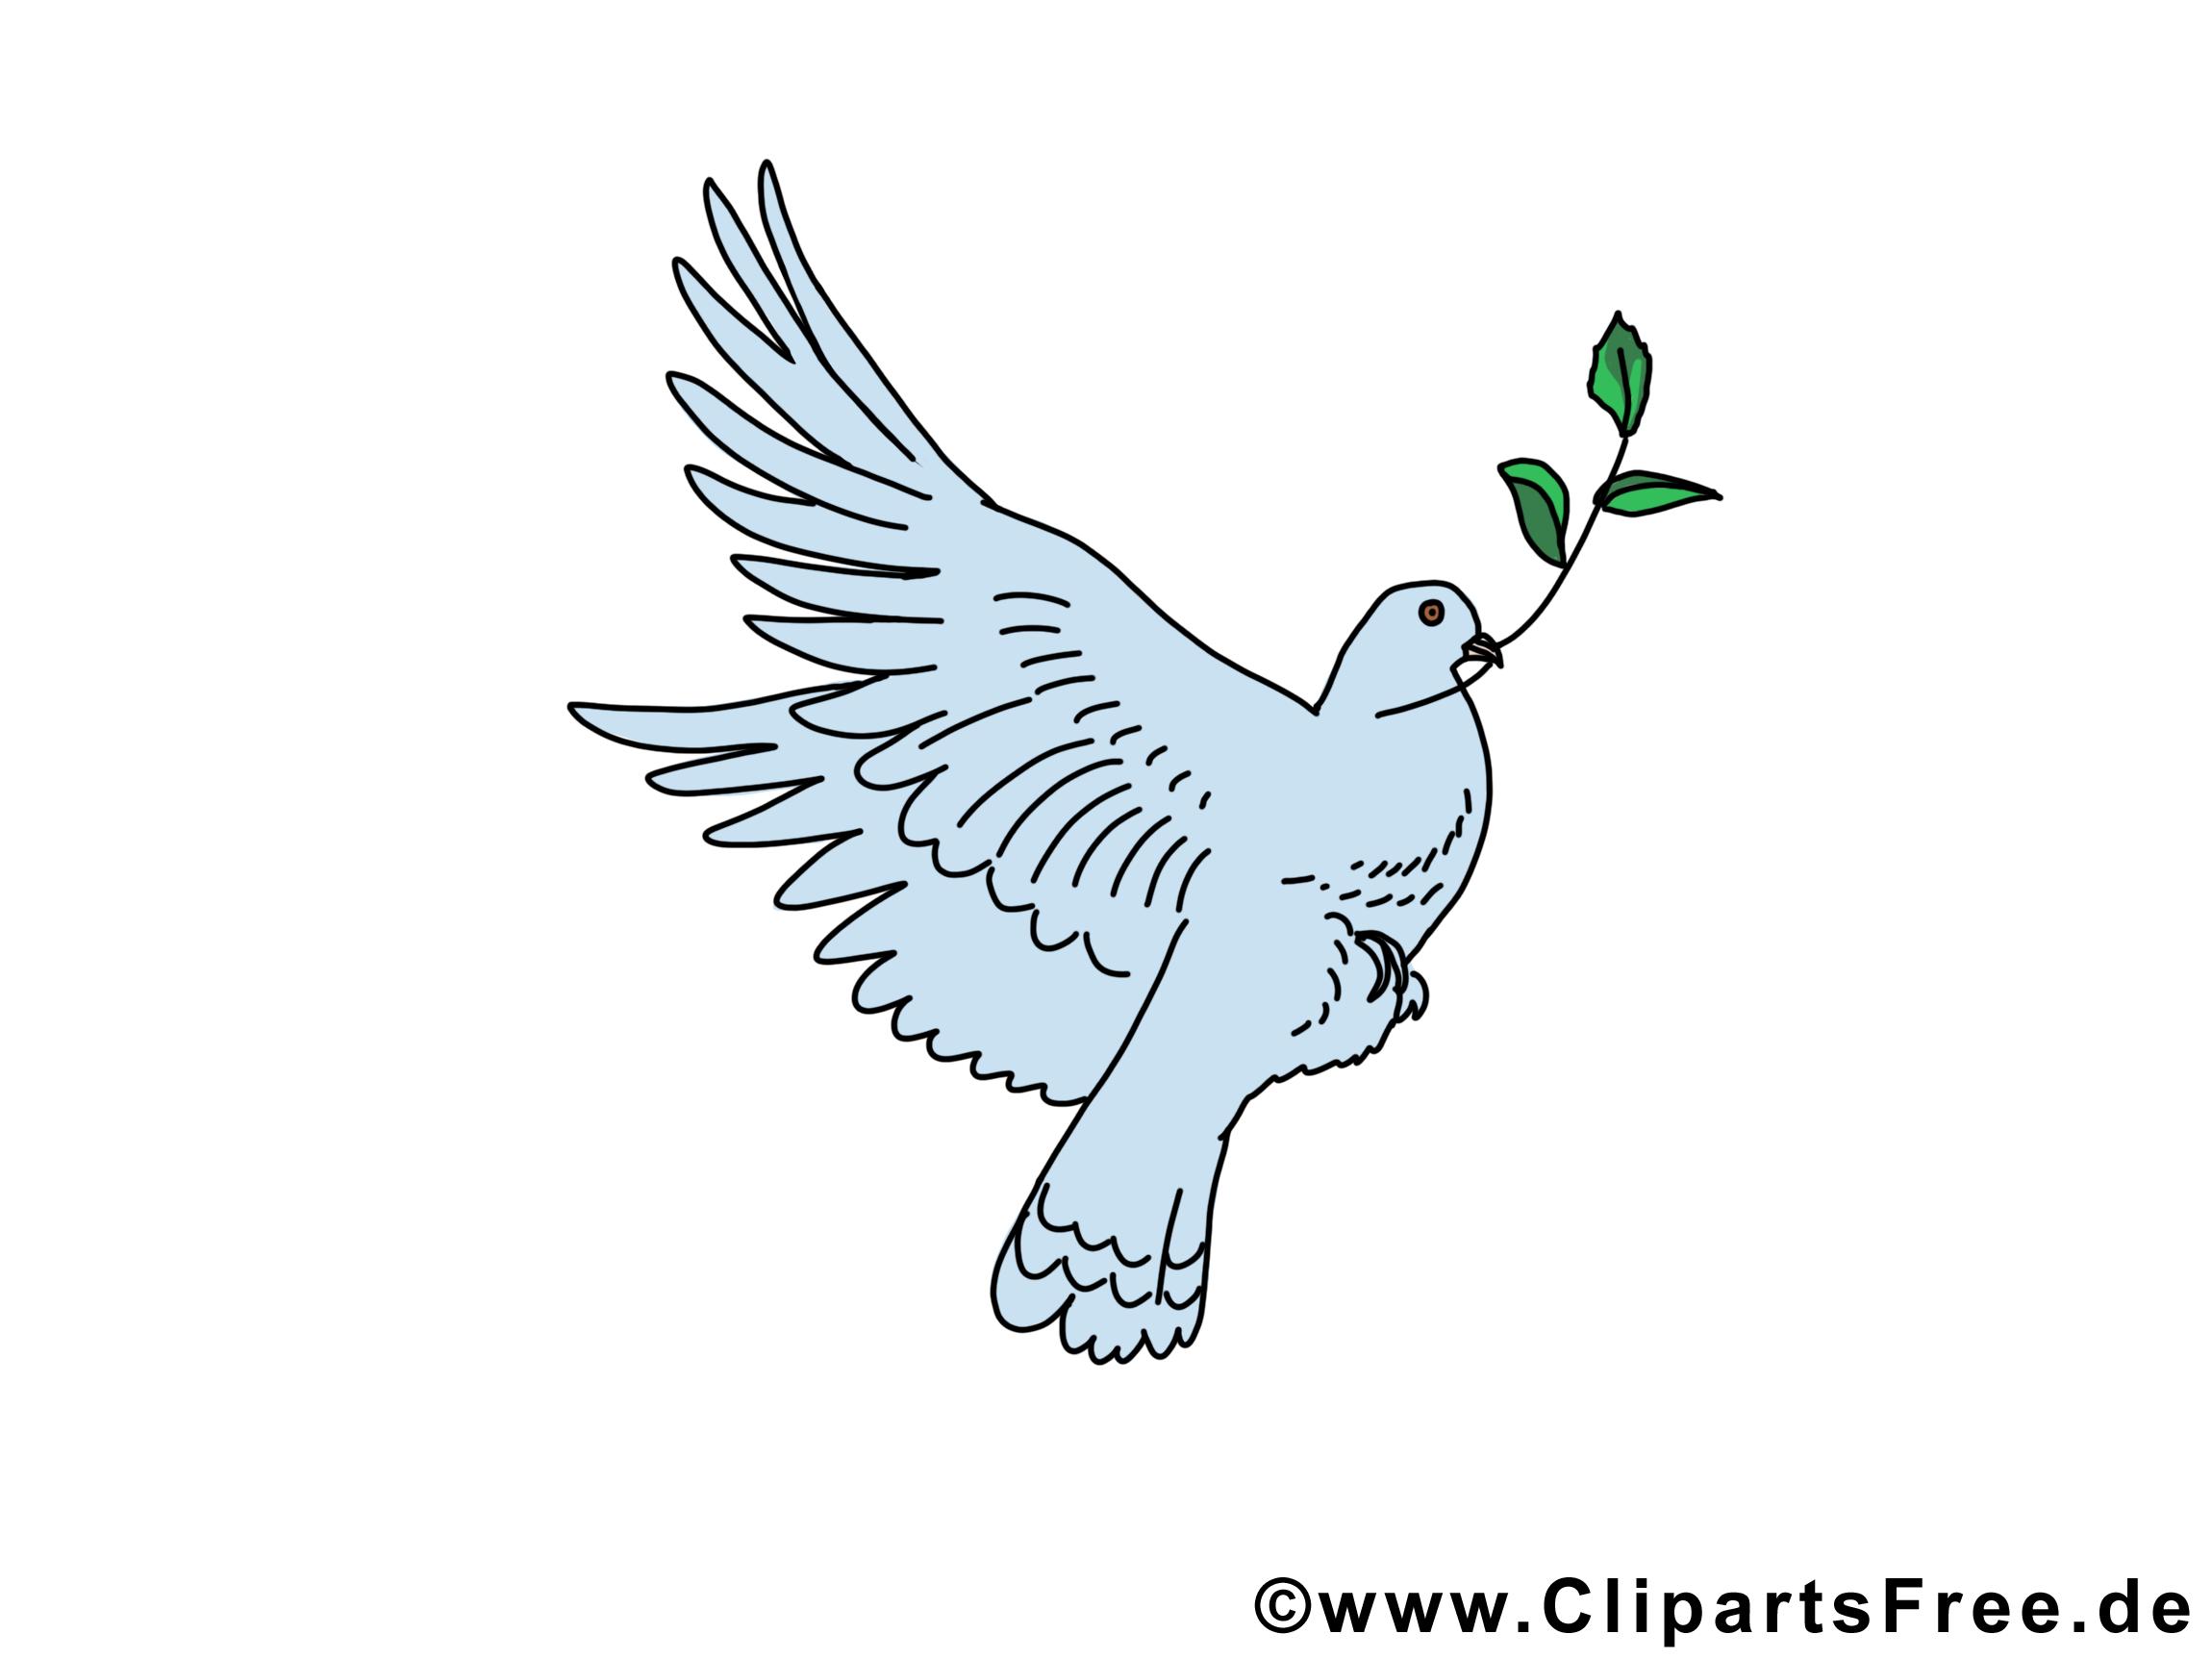 Feuille d'olivier dessin - Pentecôte images